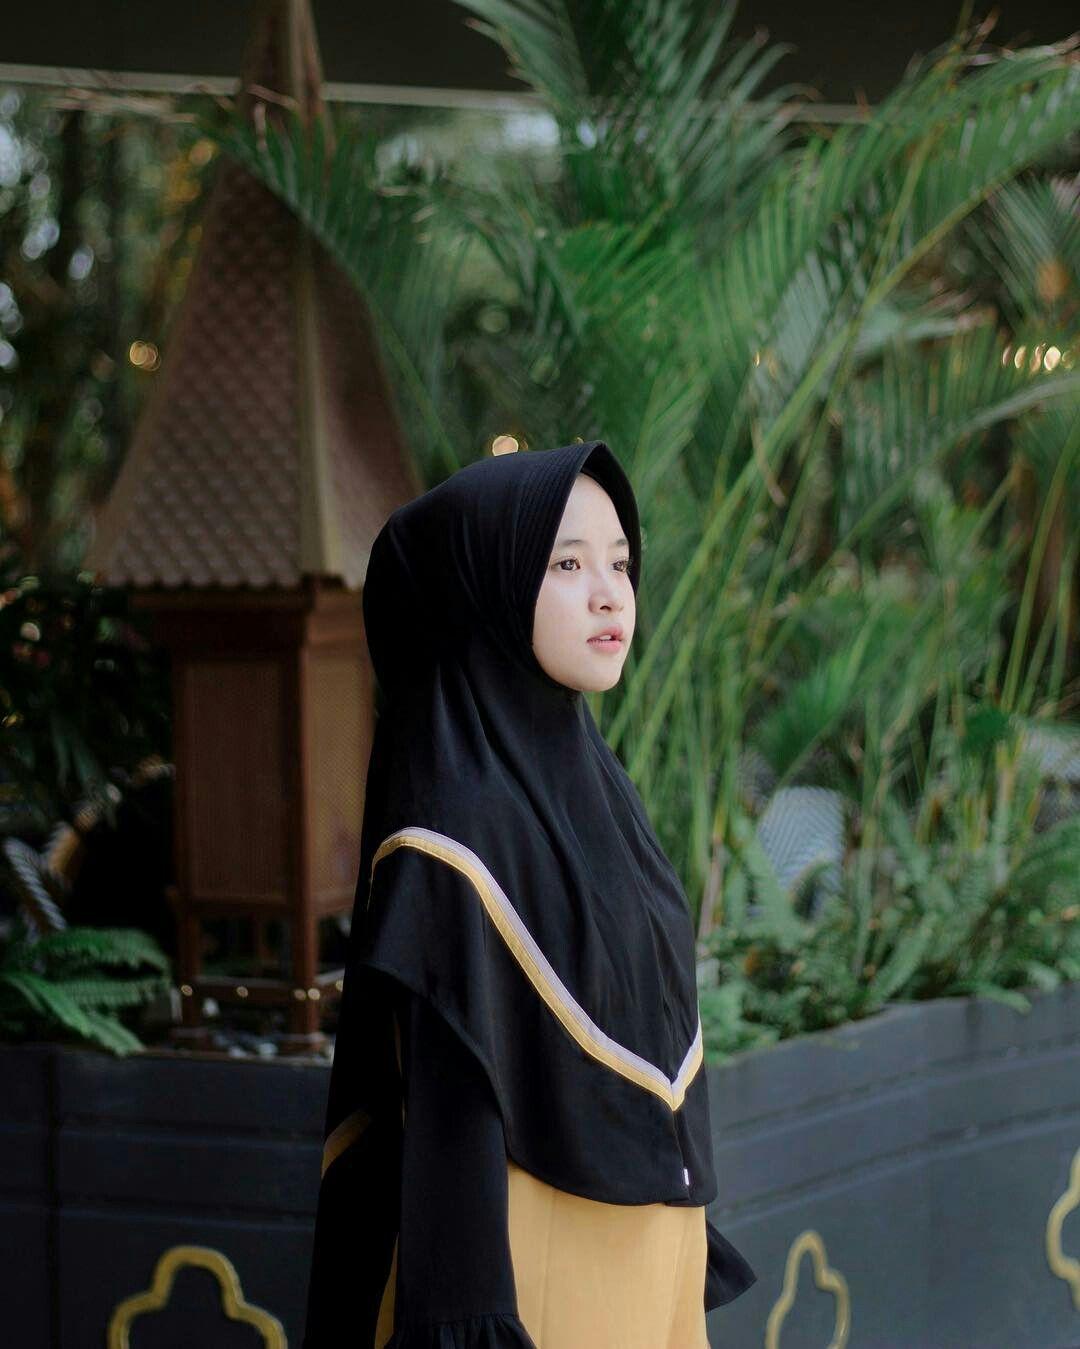 pinedward kenway on nissa | pinterest | girls in love, nissan